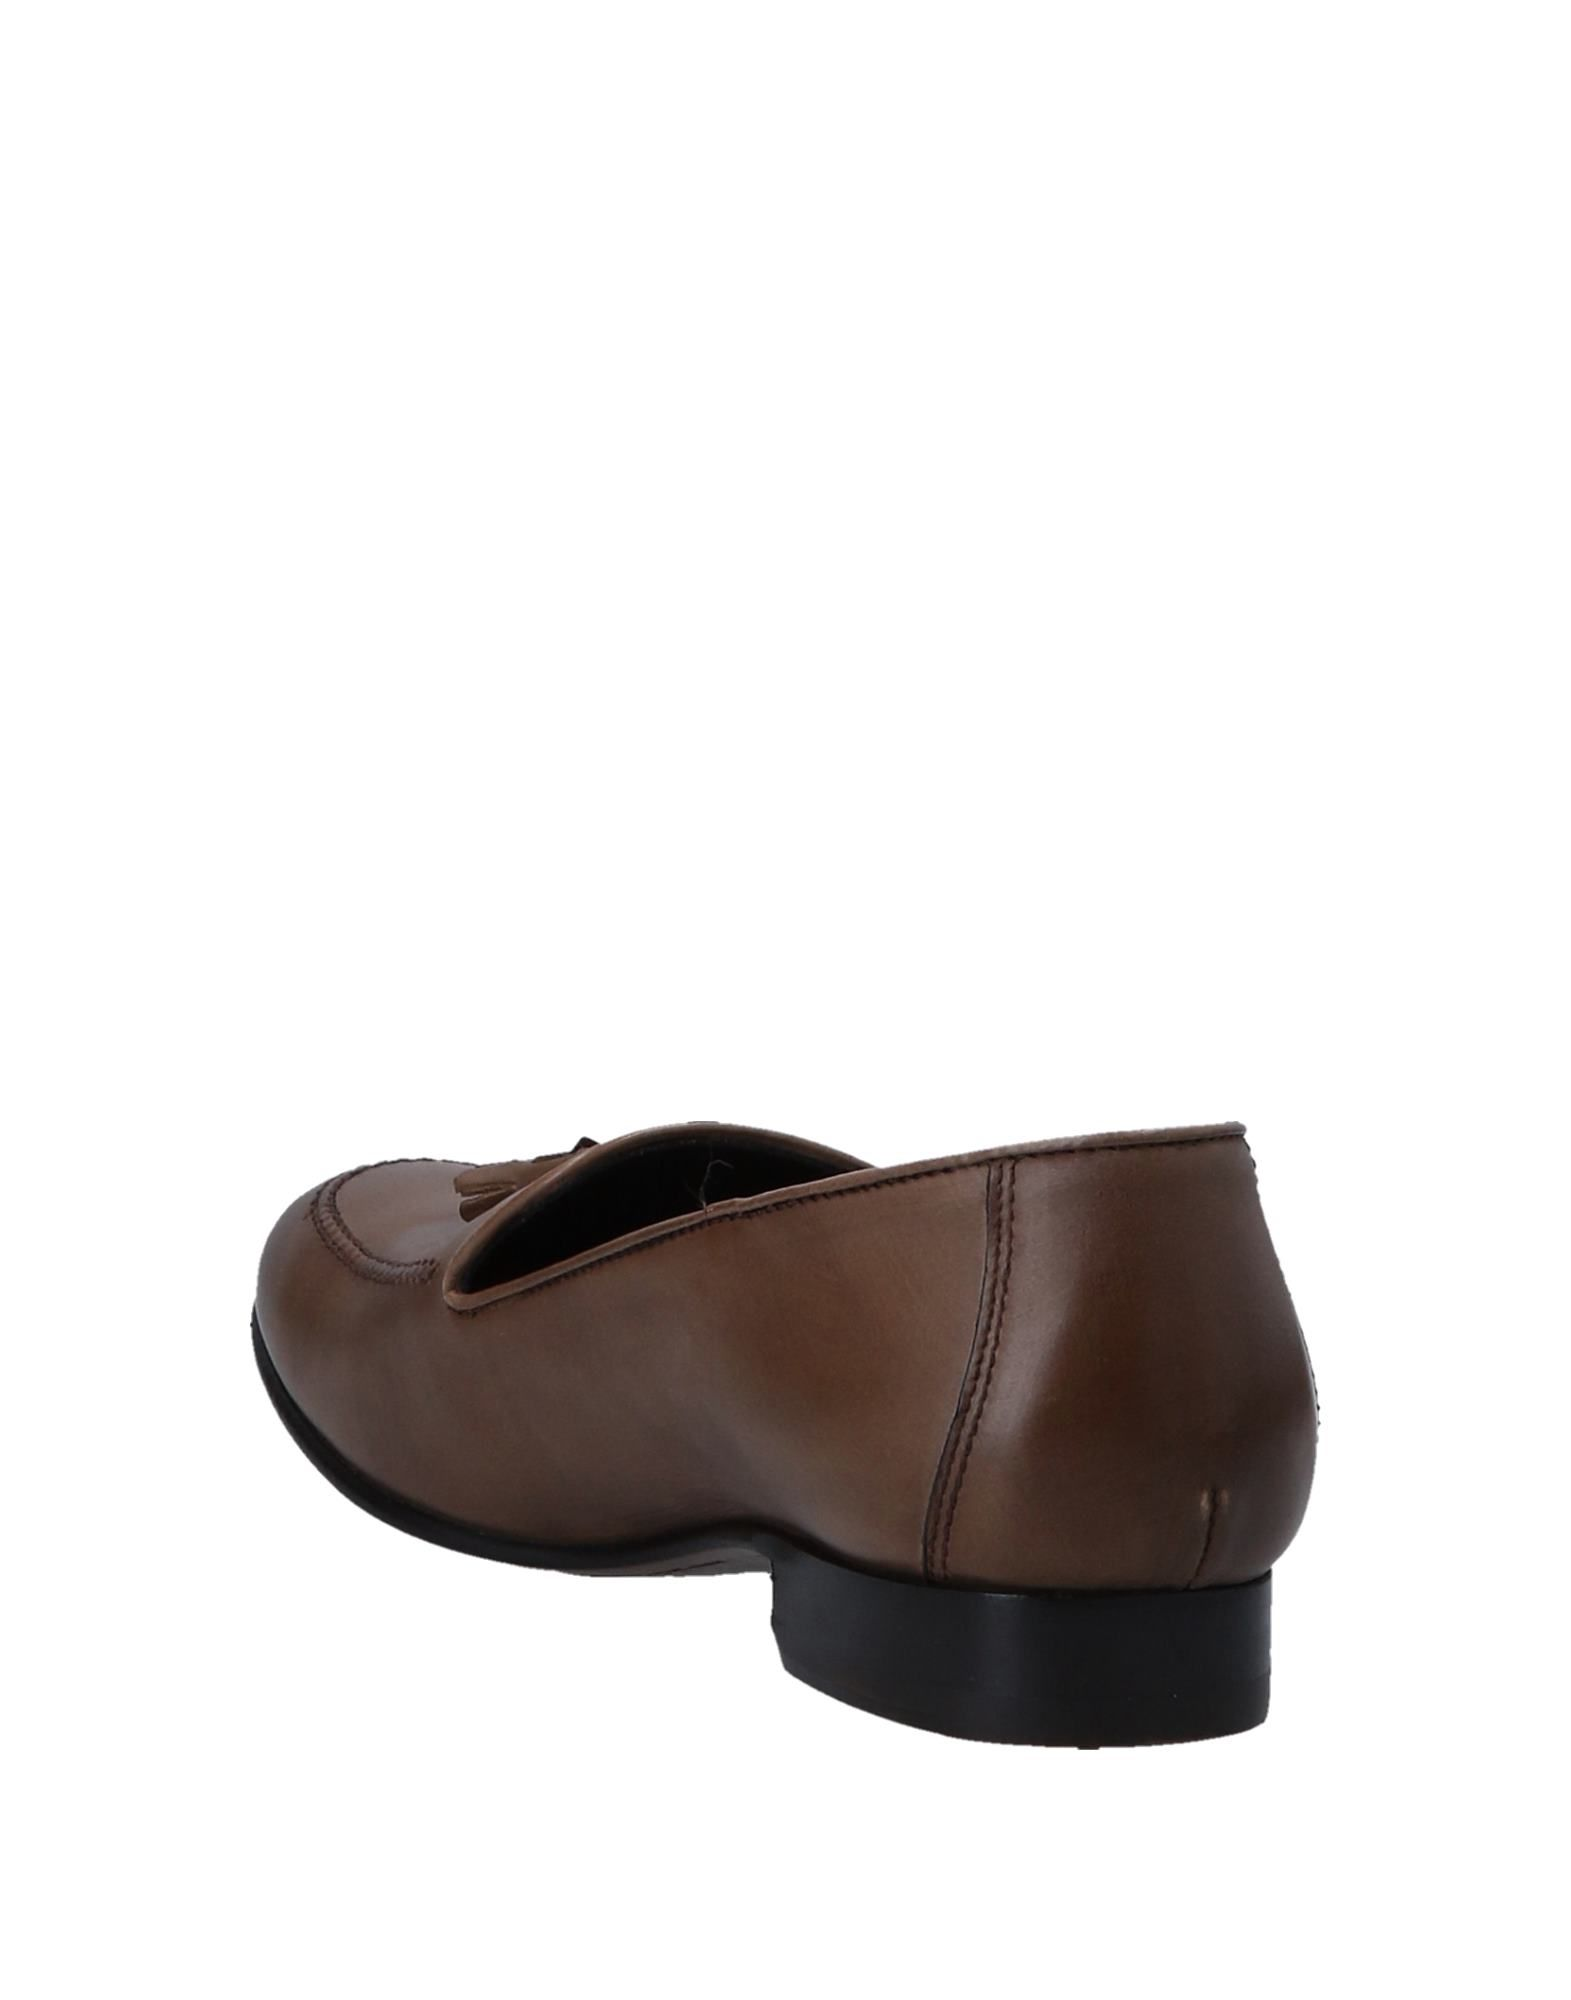 Stilvolle billige Schuhe Migliore Mokassins 11556913HT Damen  11556913HT Mokassins 4892de